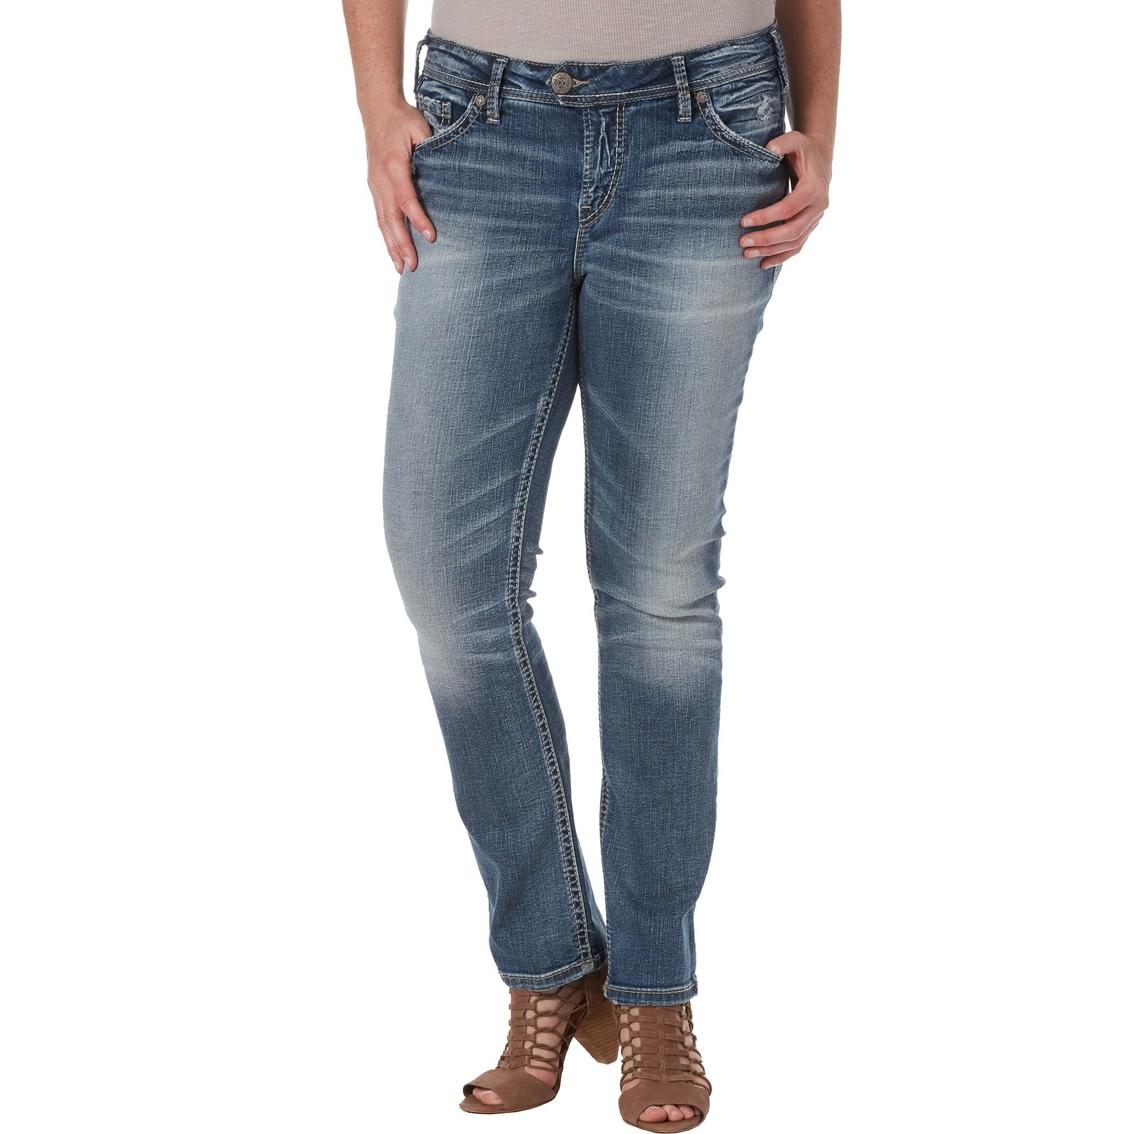 e19ddcb01da Silver Jeans Co. Plus Size Tuesday Low Slim Boot Jeans